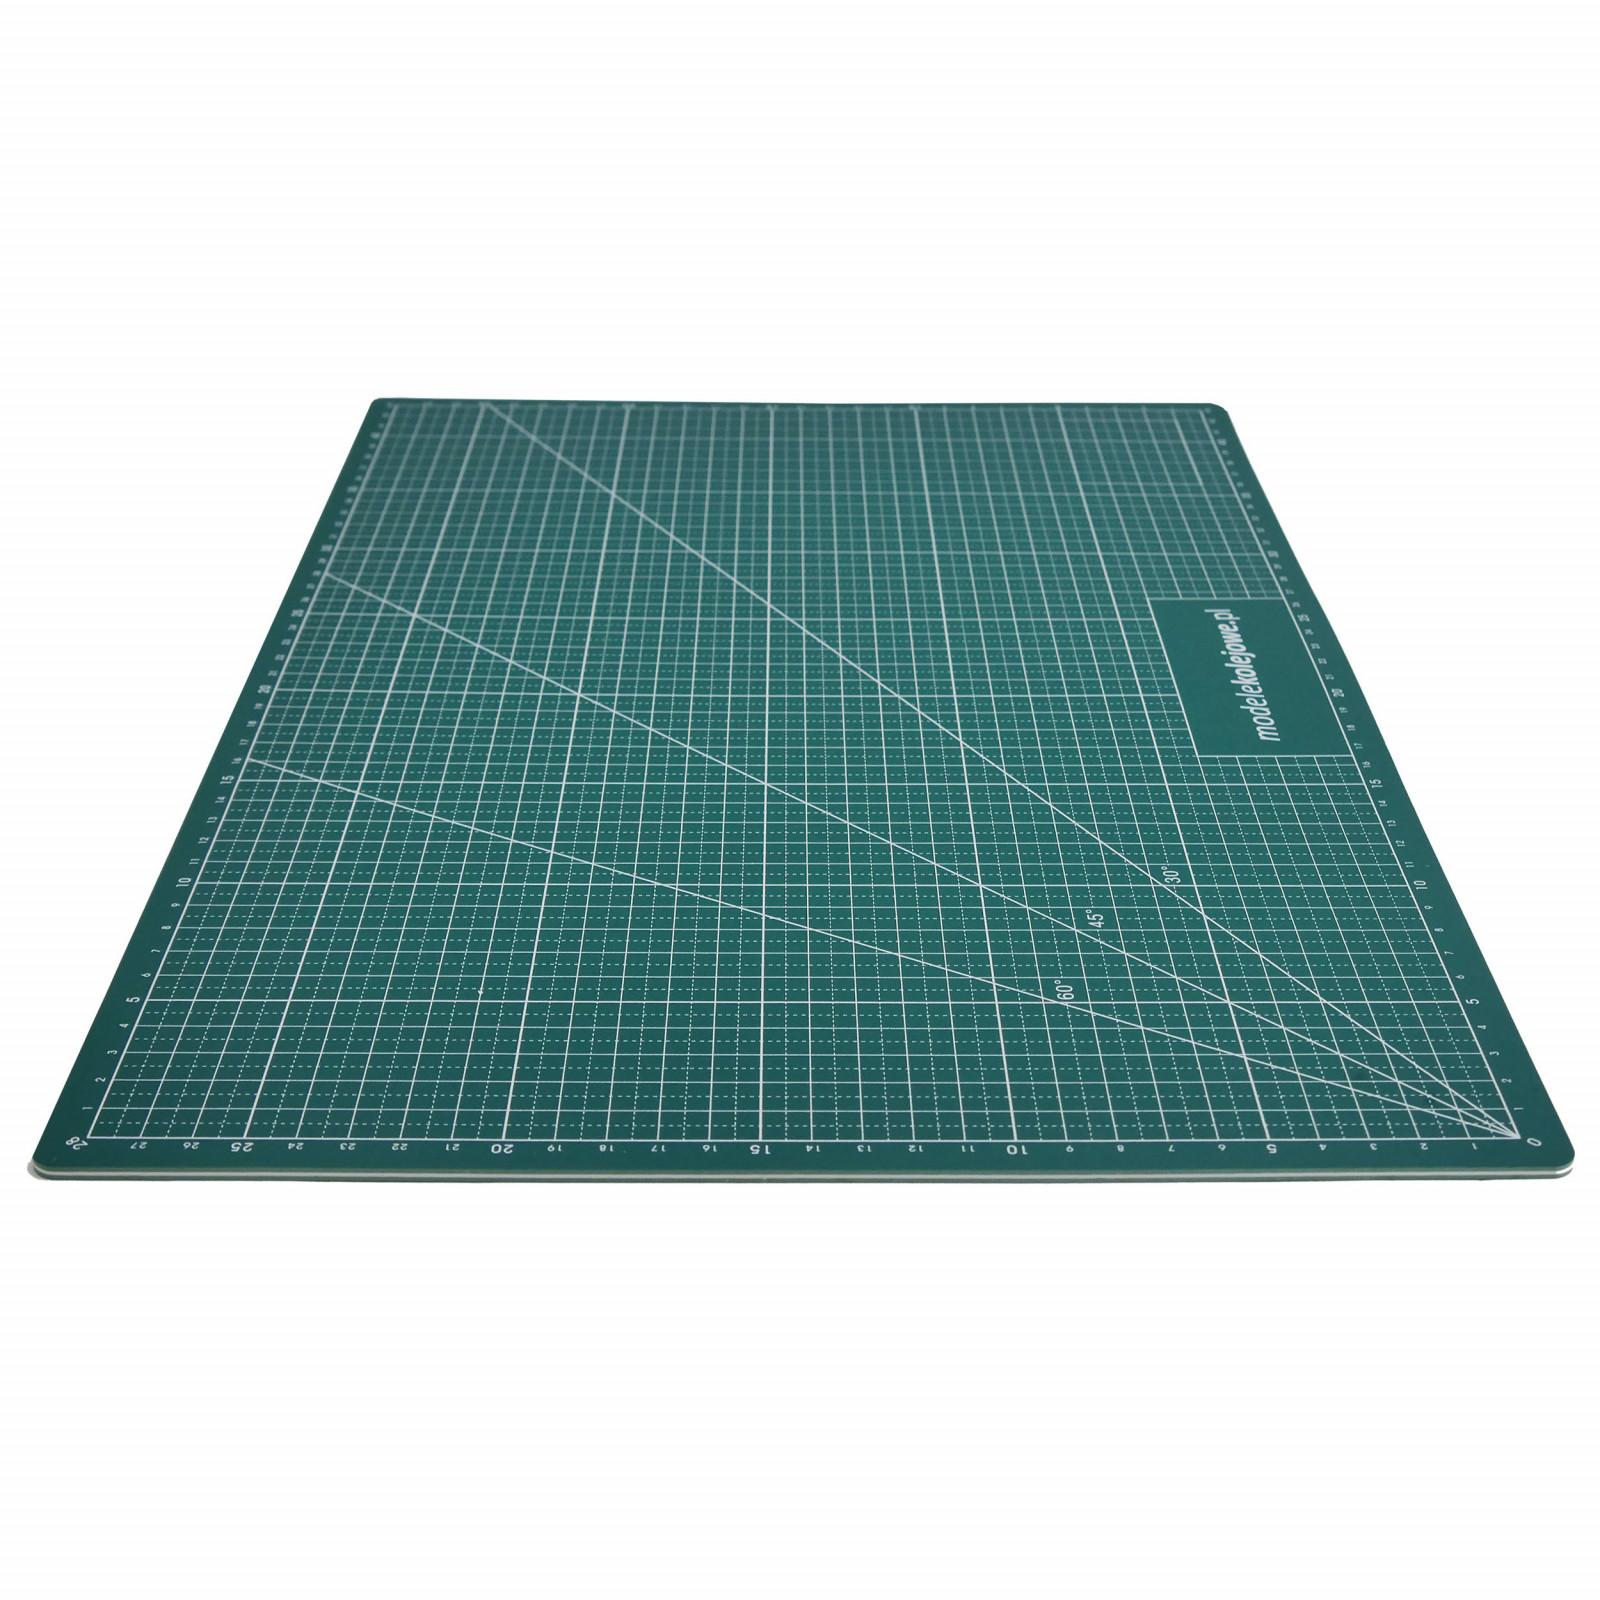 Rezacia podložka 5 vrstiev 45x30cm A3 megamix.sk